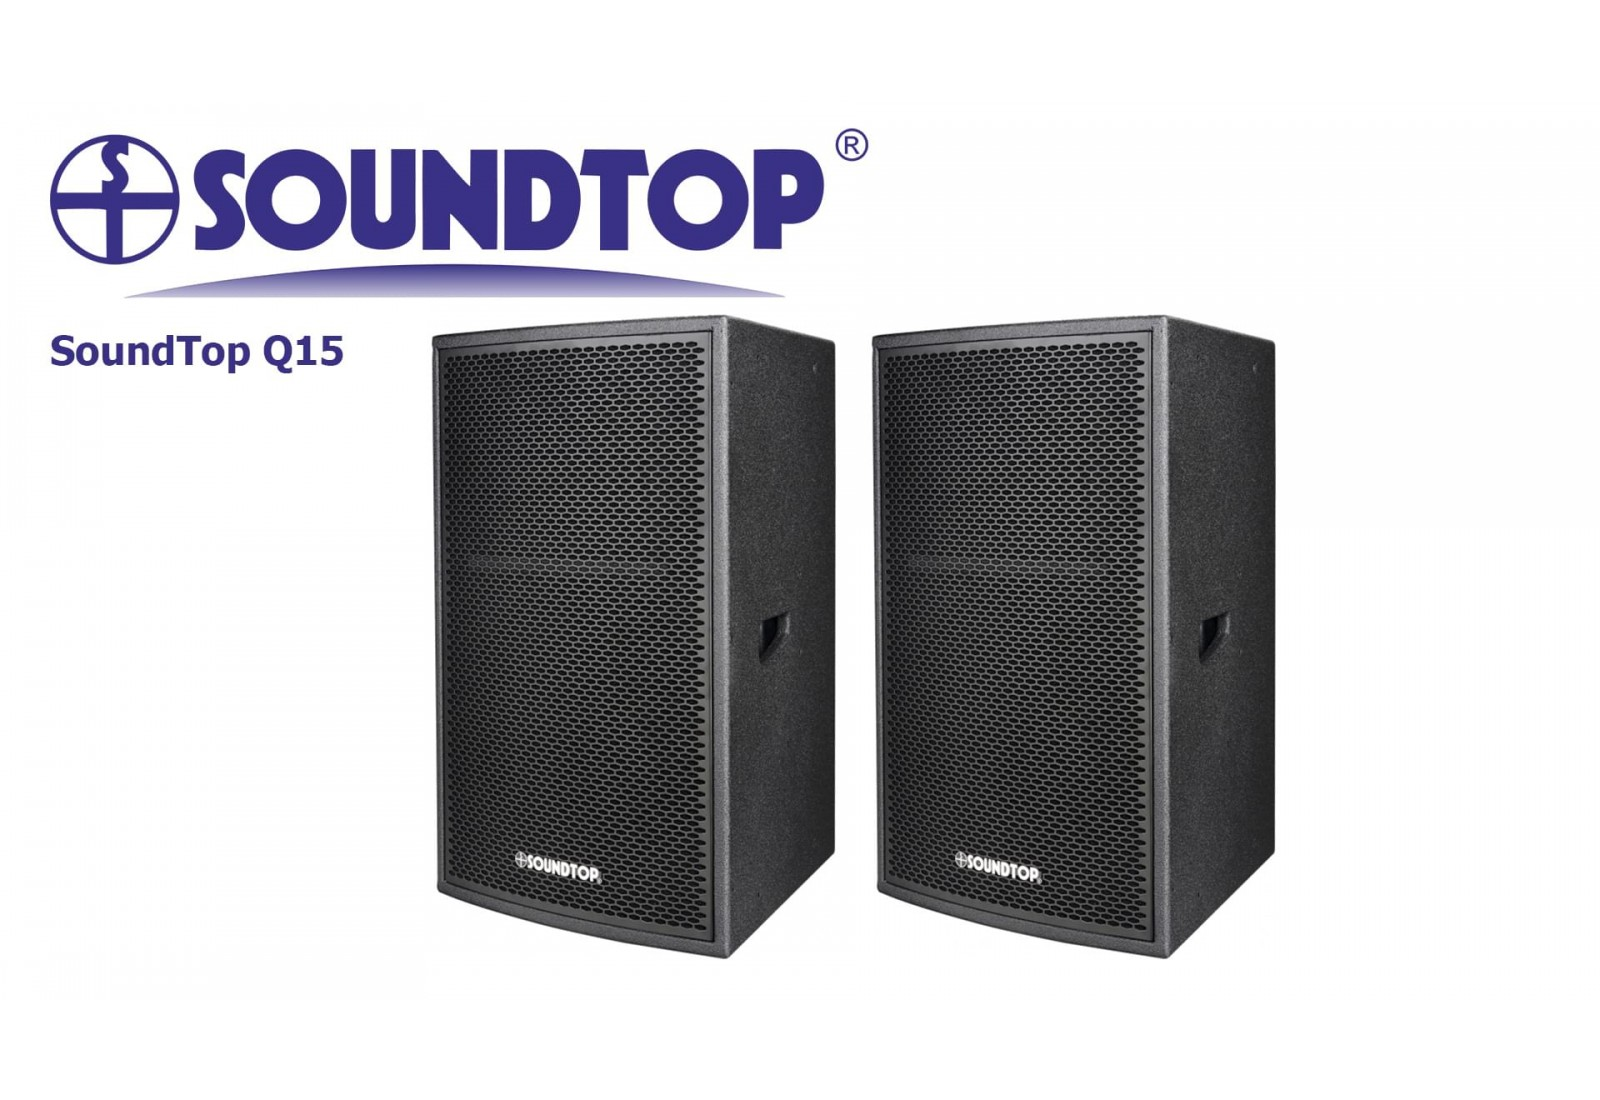 SoundTop Q15